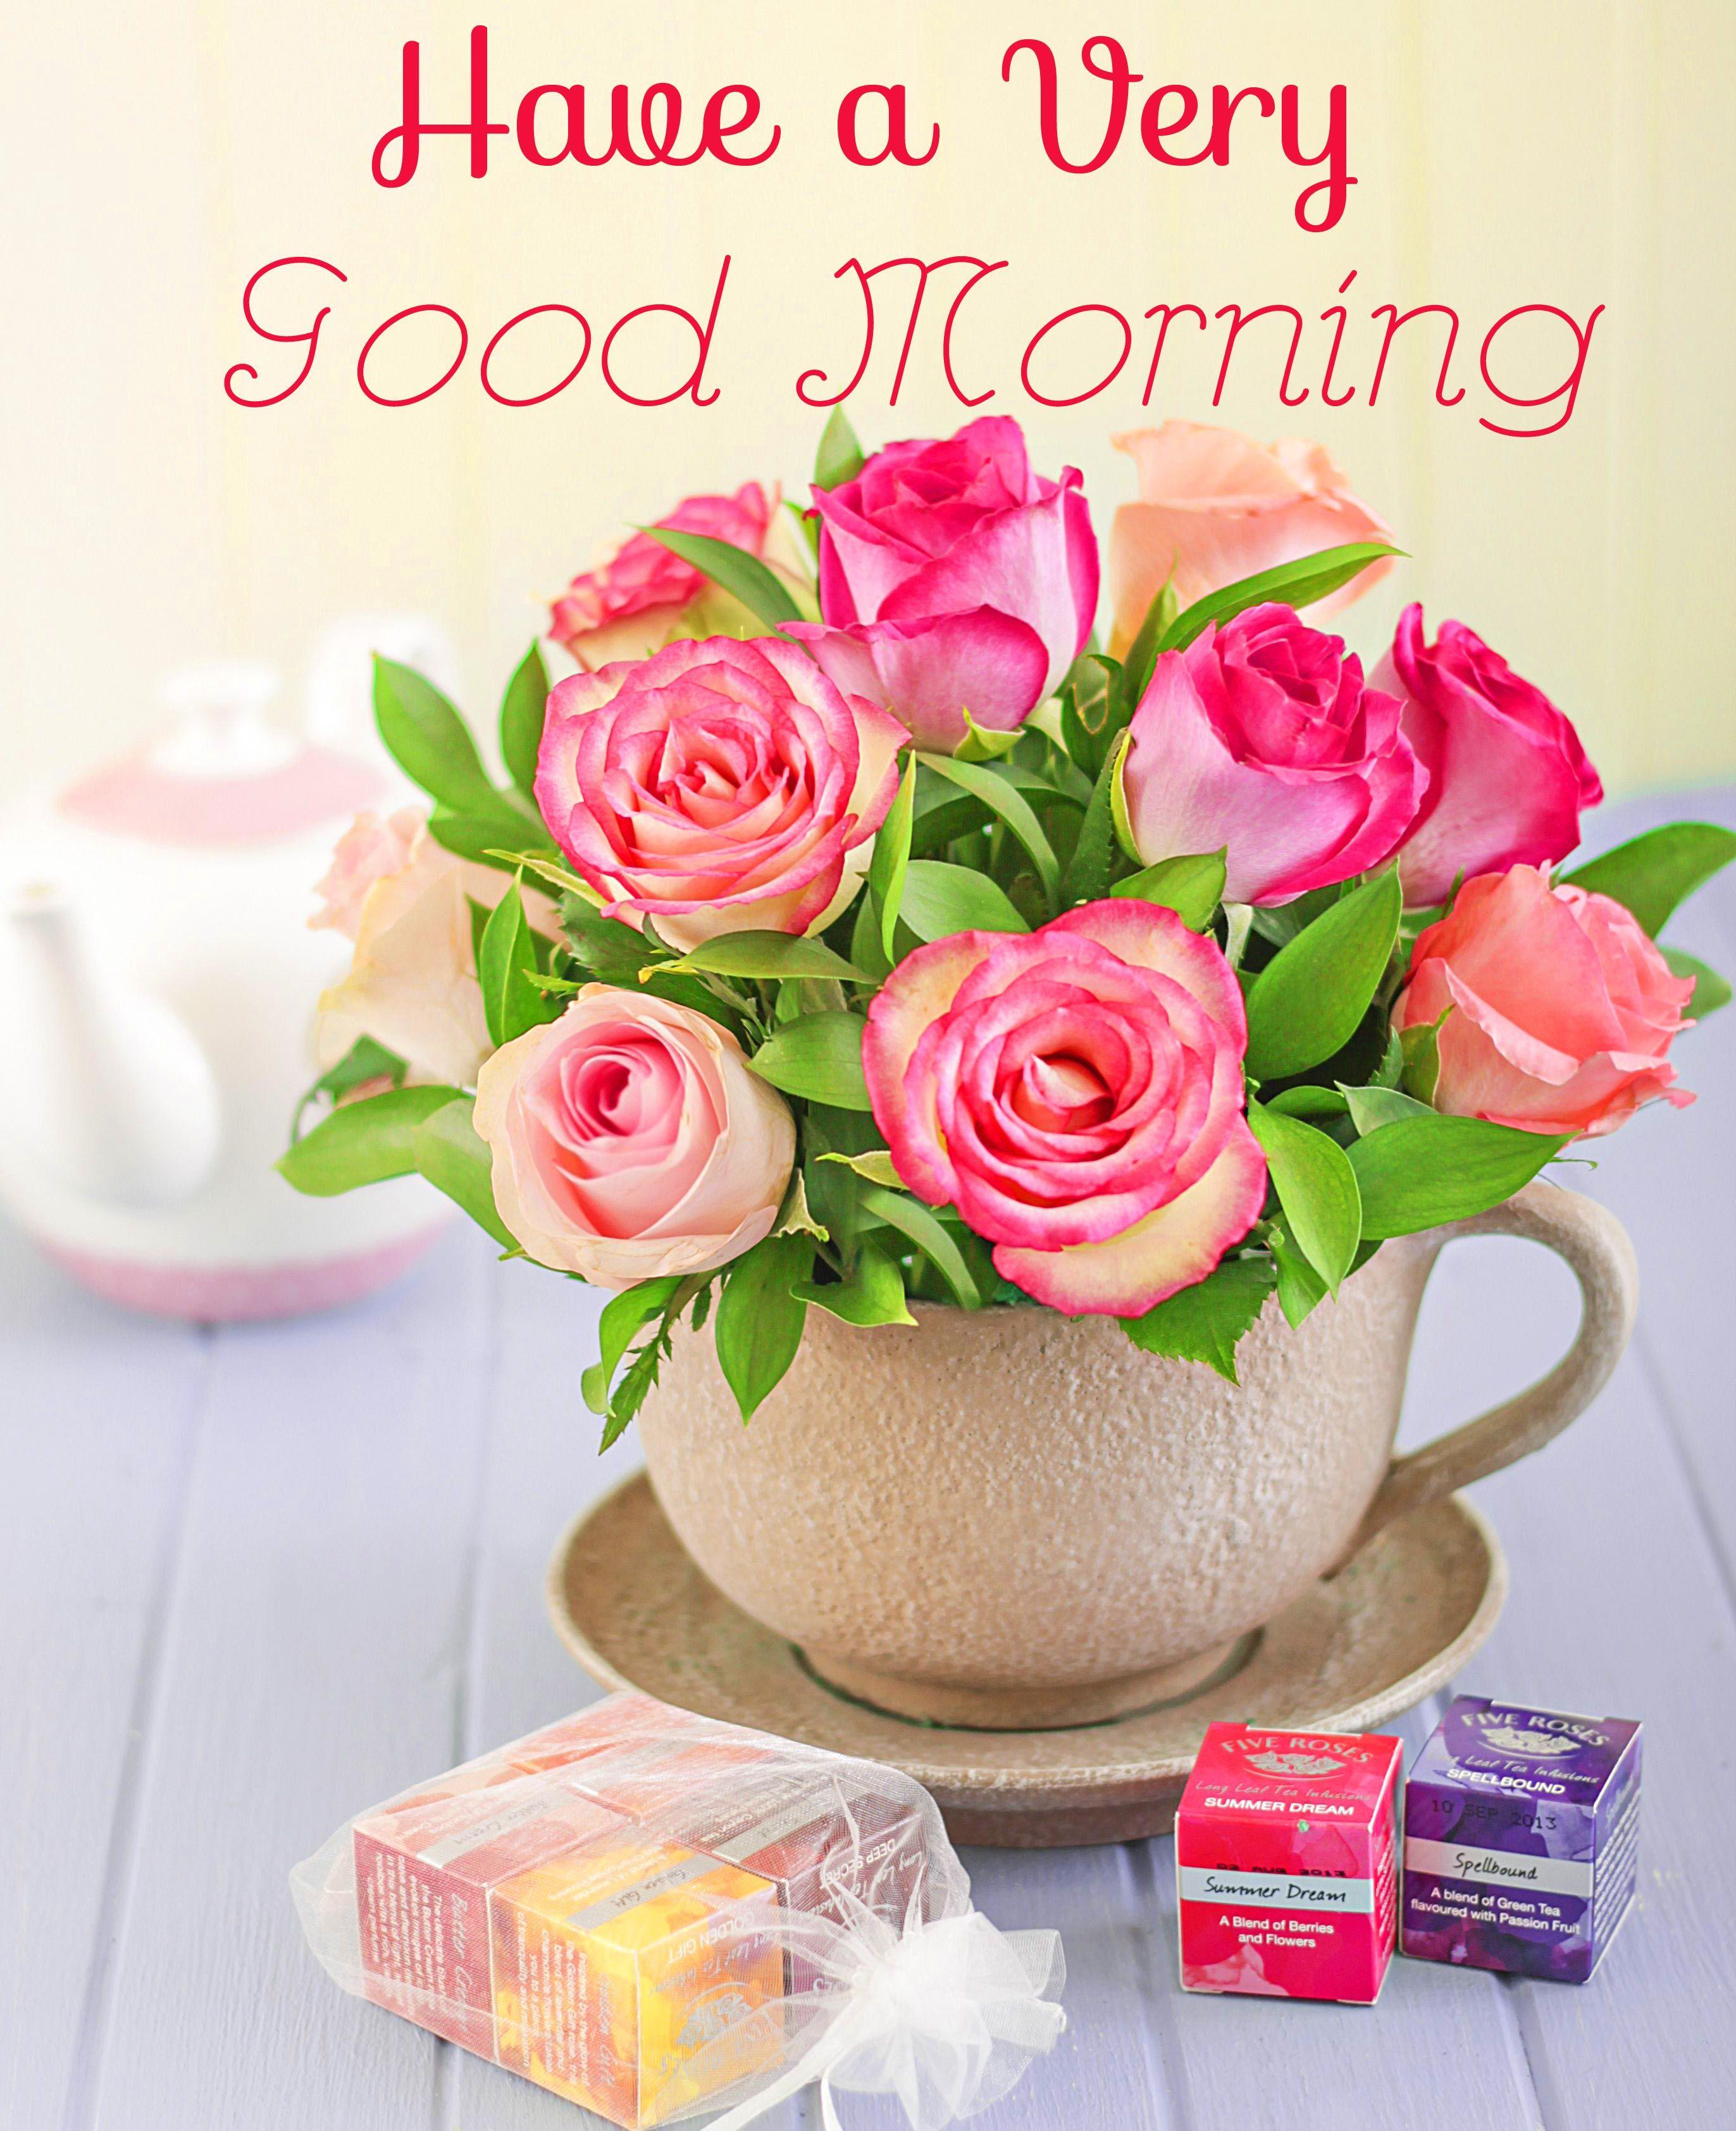 Good Morning S Lavanya Morning Greetings Quotes Good Morning Quotes Good Morning Greetings